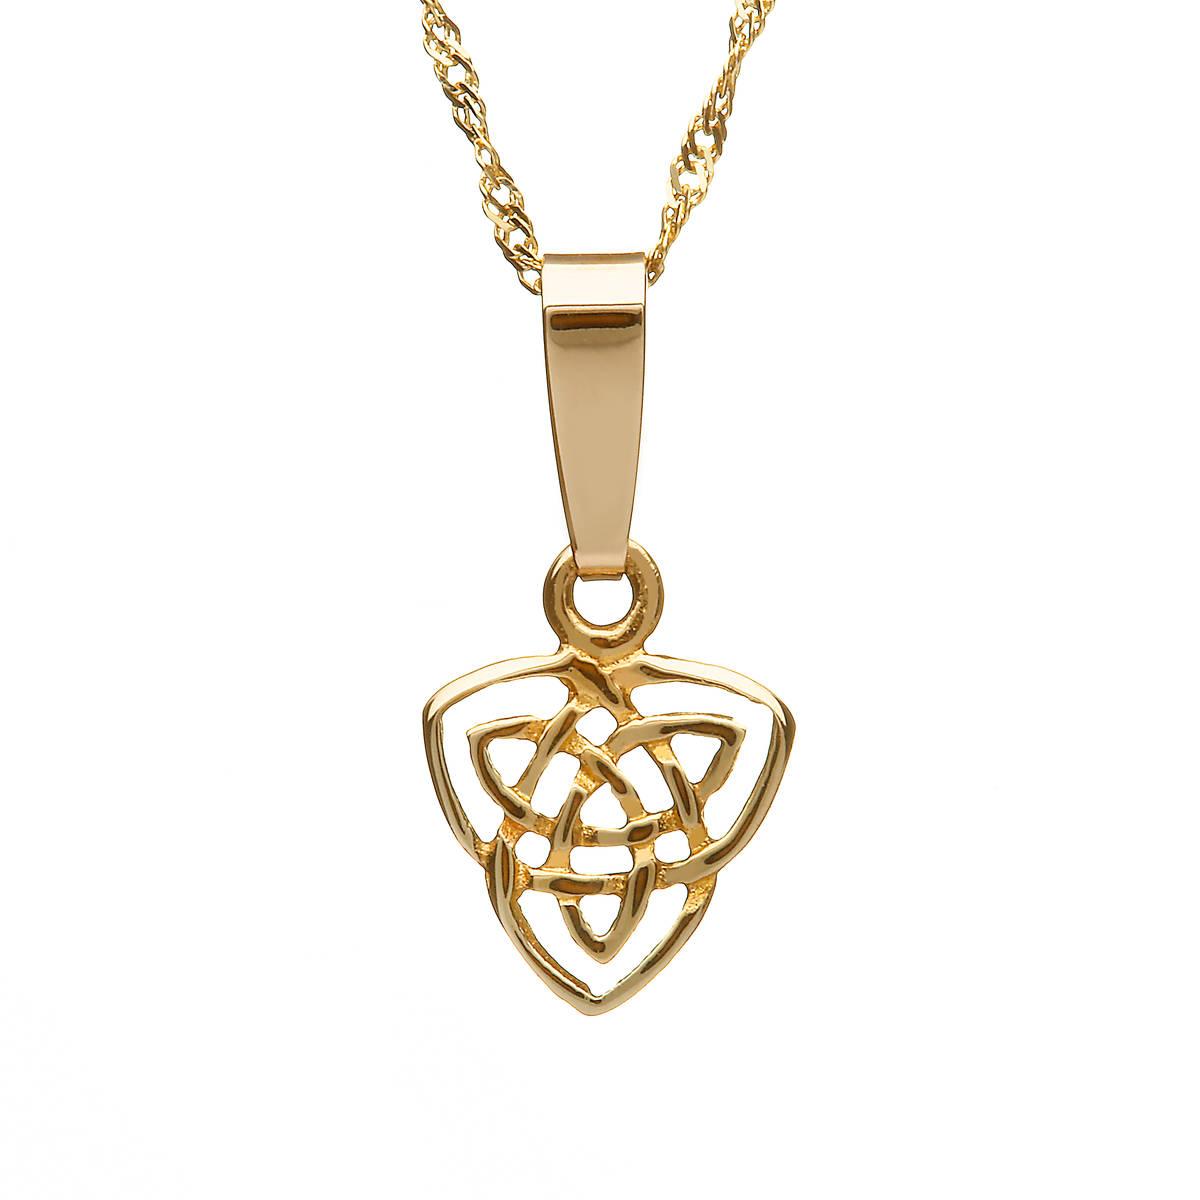 "10ct Trinity Knot Pendant 18"" Chain"